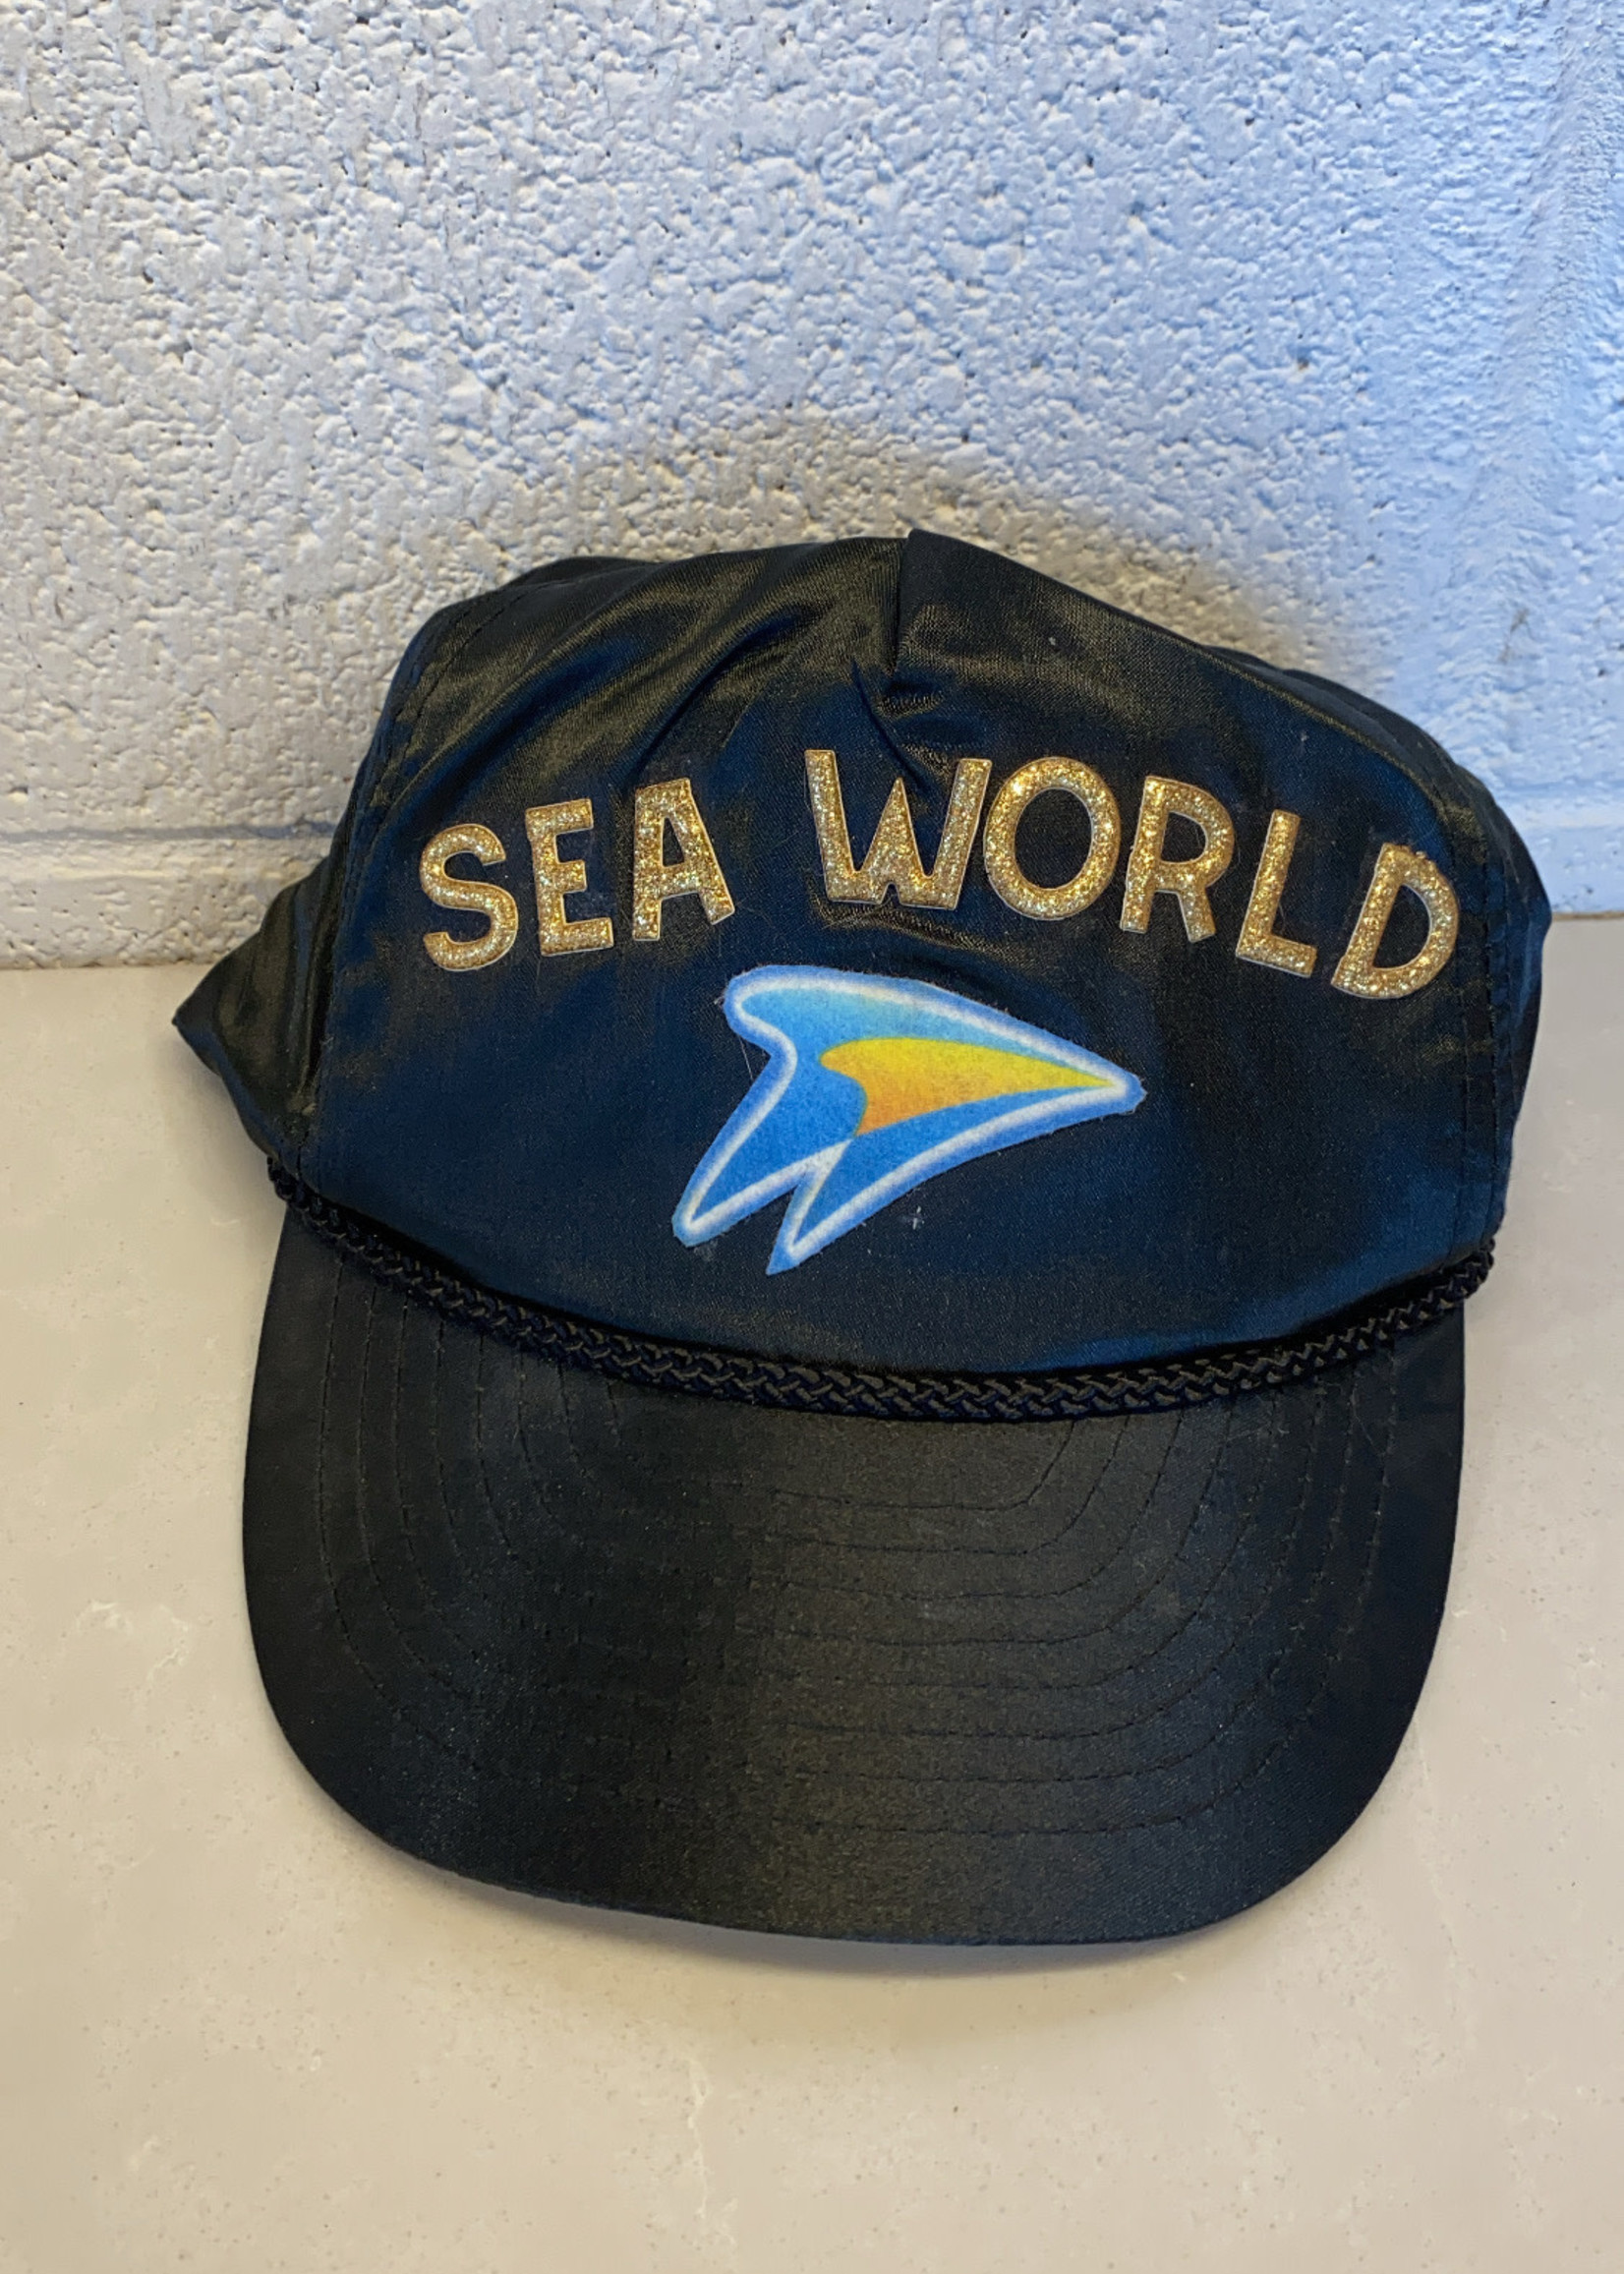 Vintage Seaworld Hat